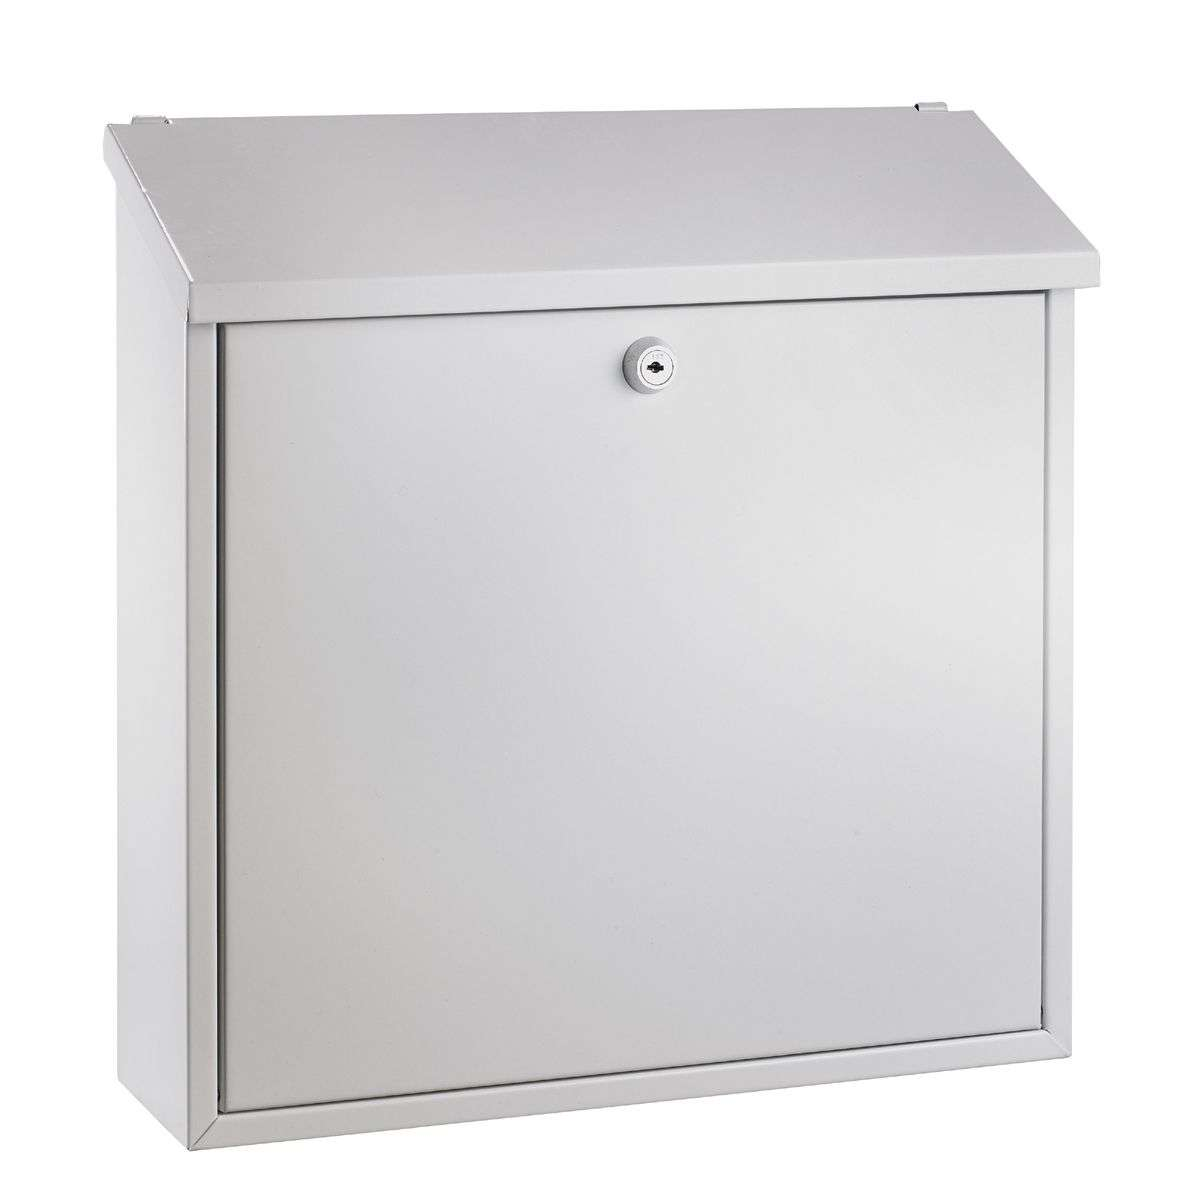 Letterbox Mate white-1003096-31